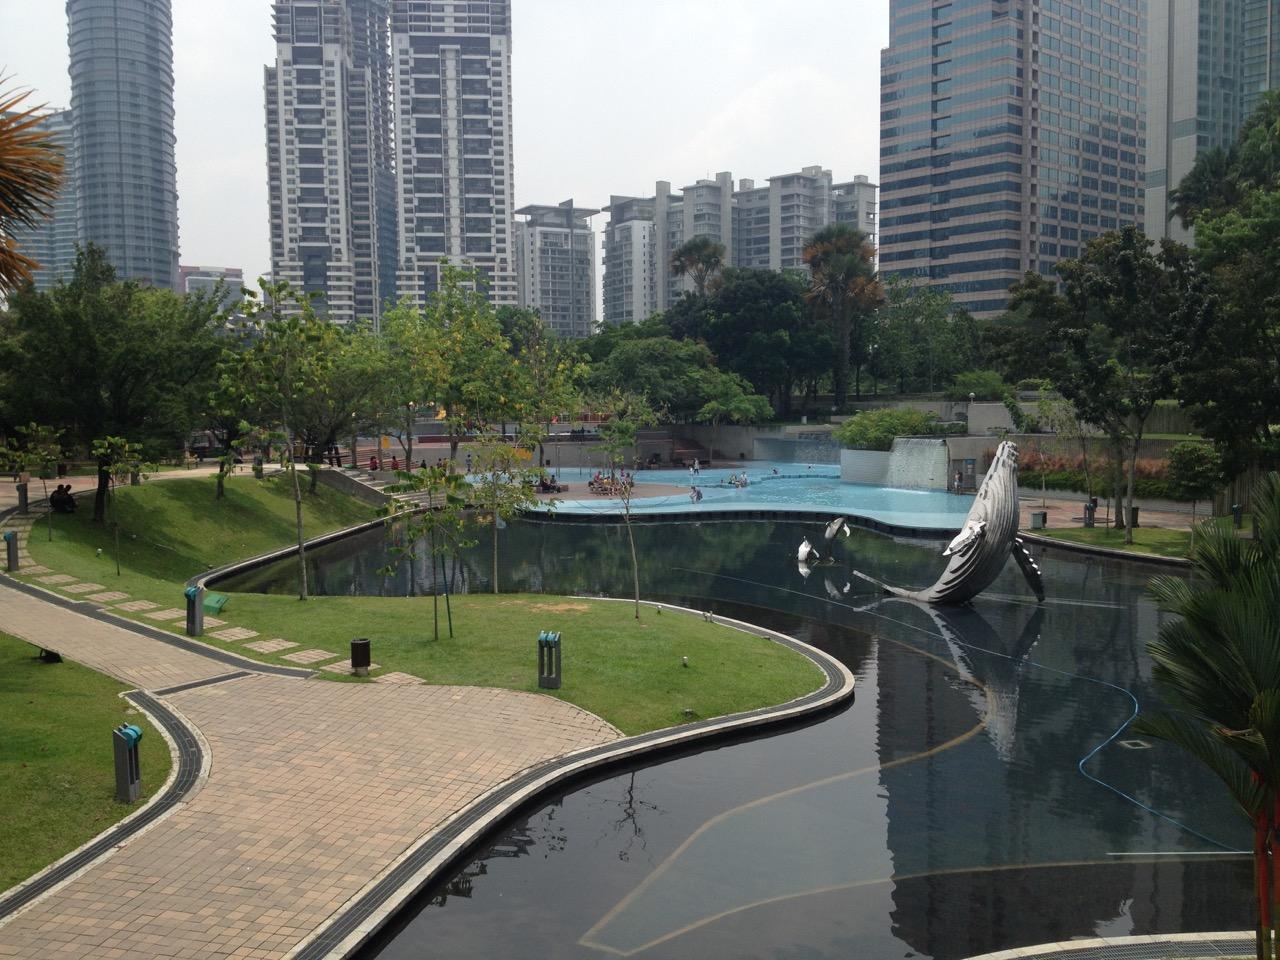 Kuala Lumpur Photos: KLCC